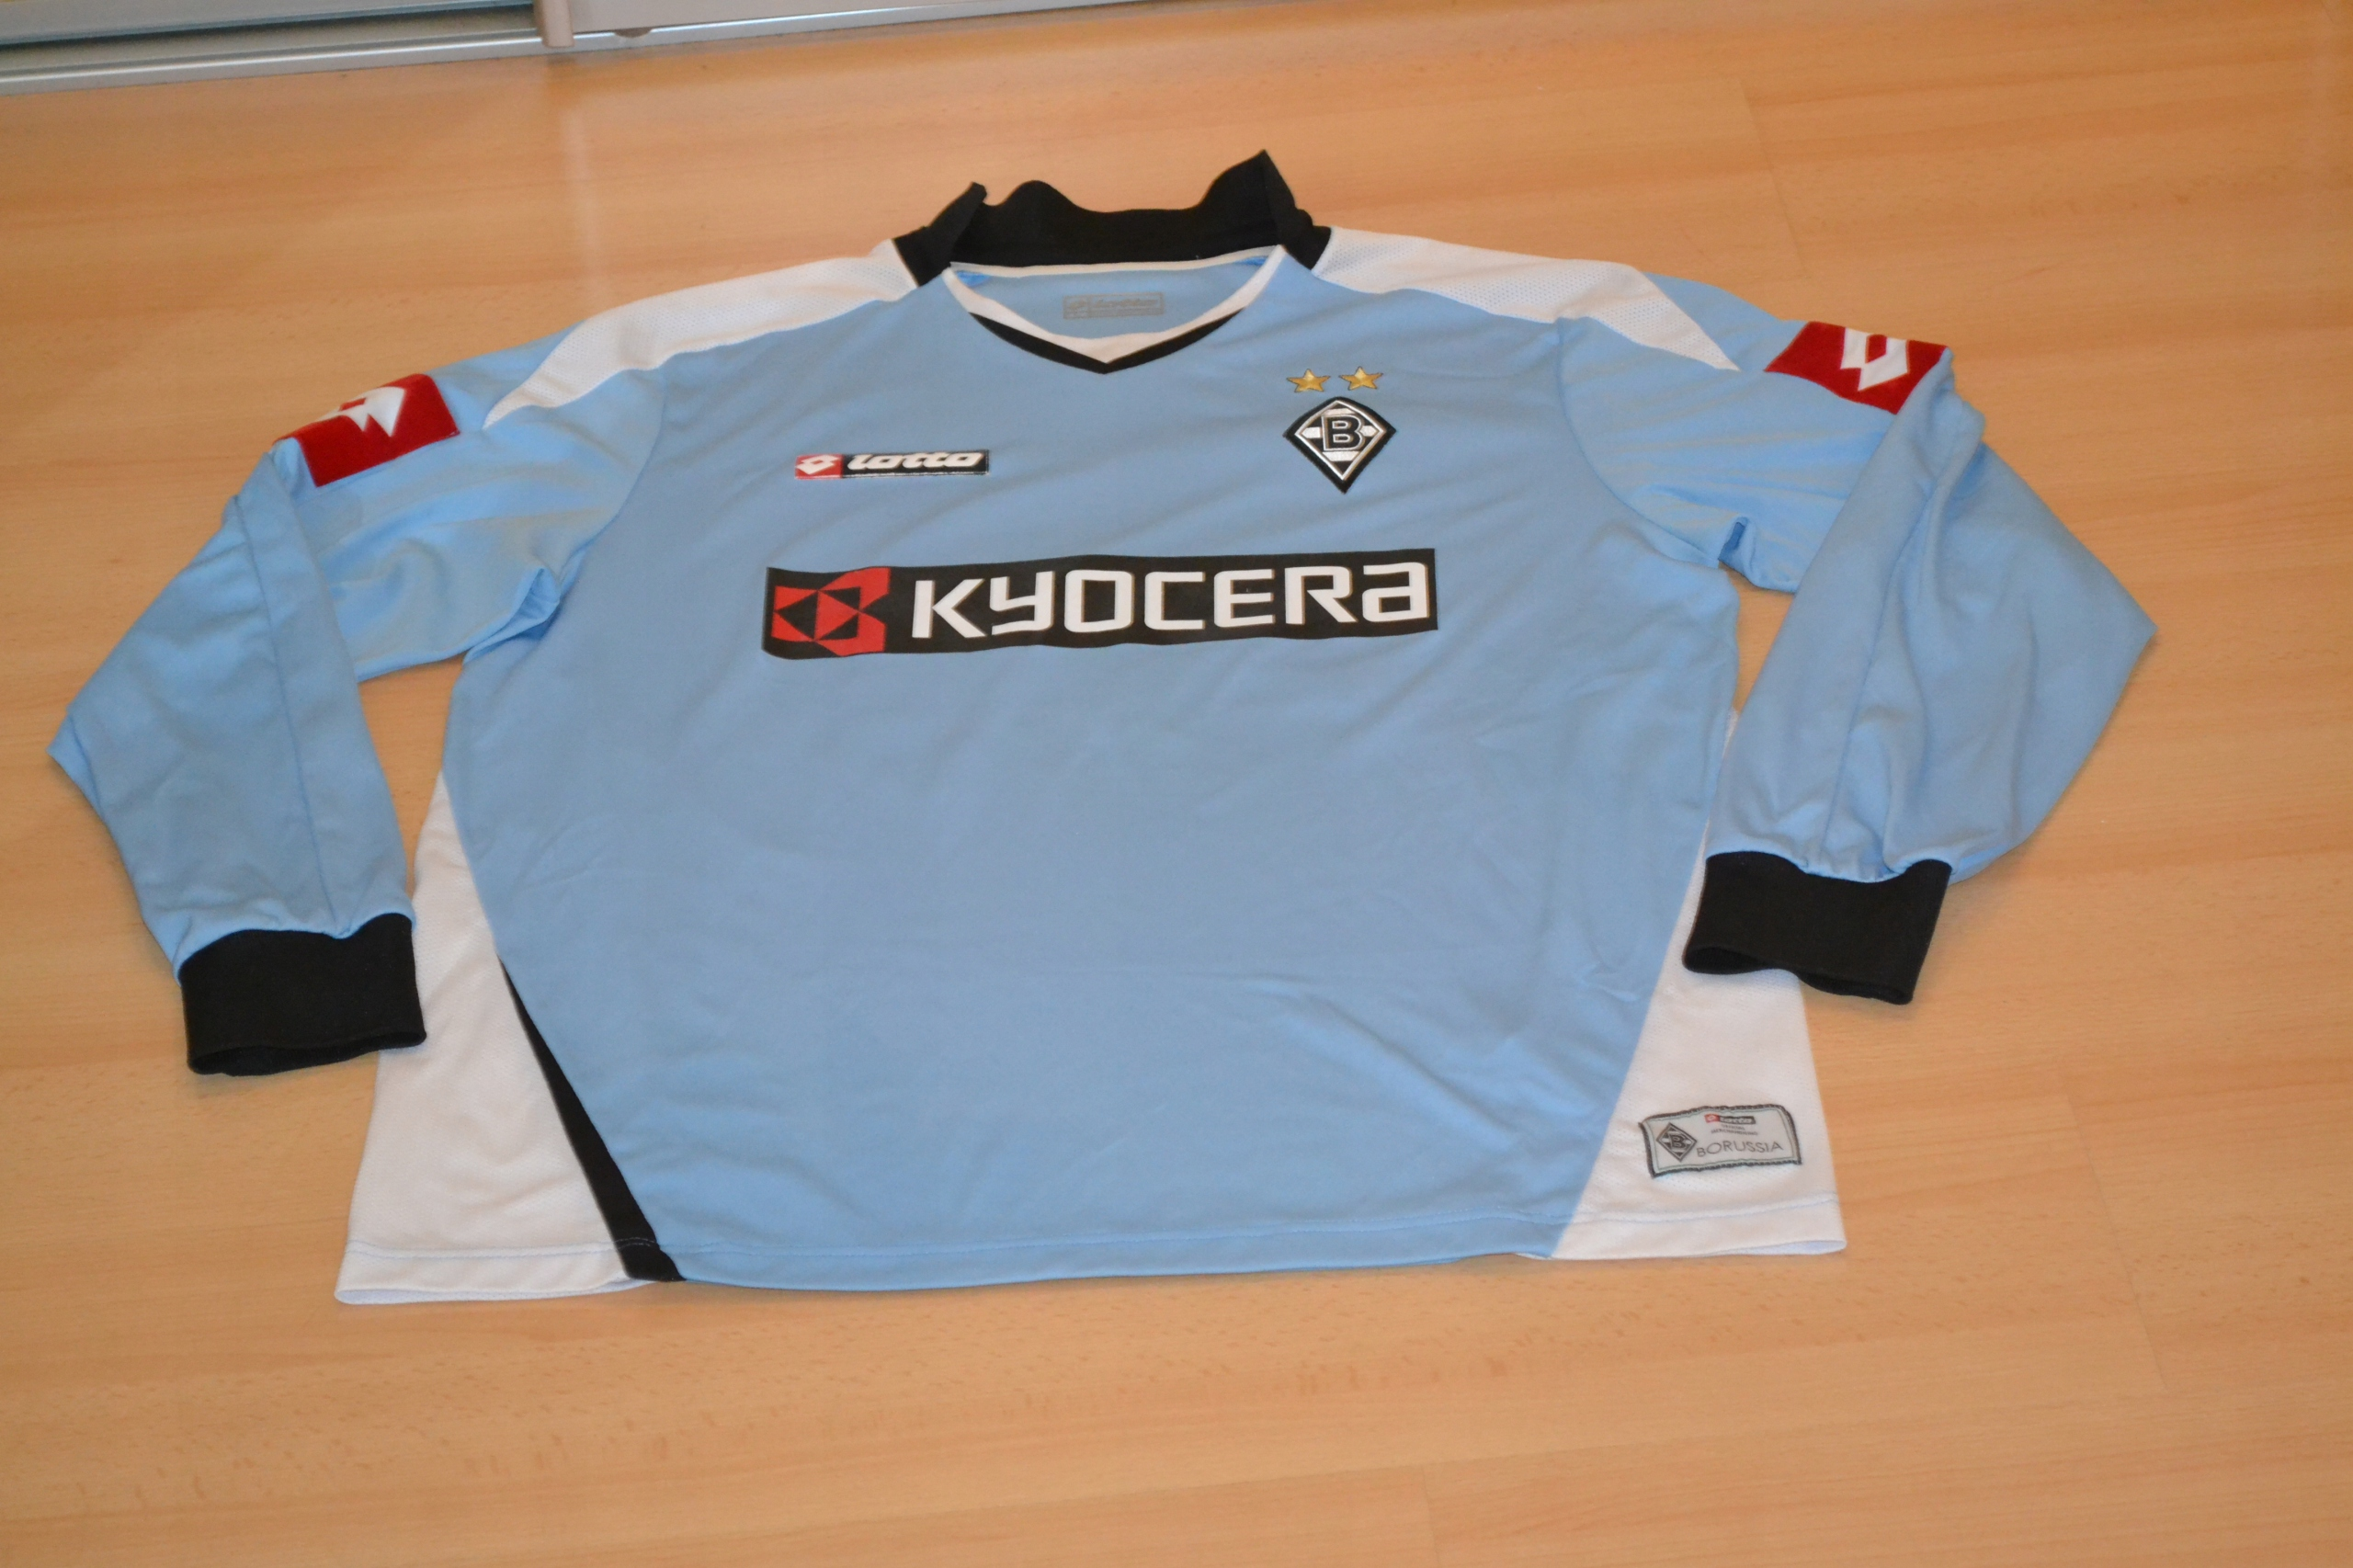 2007-08 Borussia Monchengldach trzecia